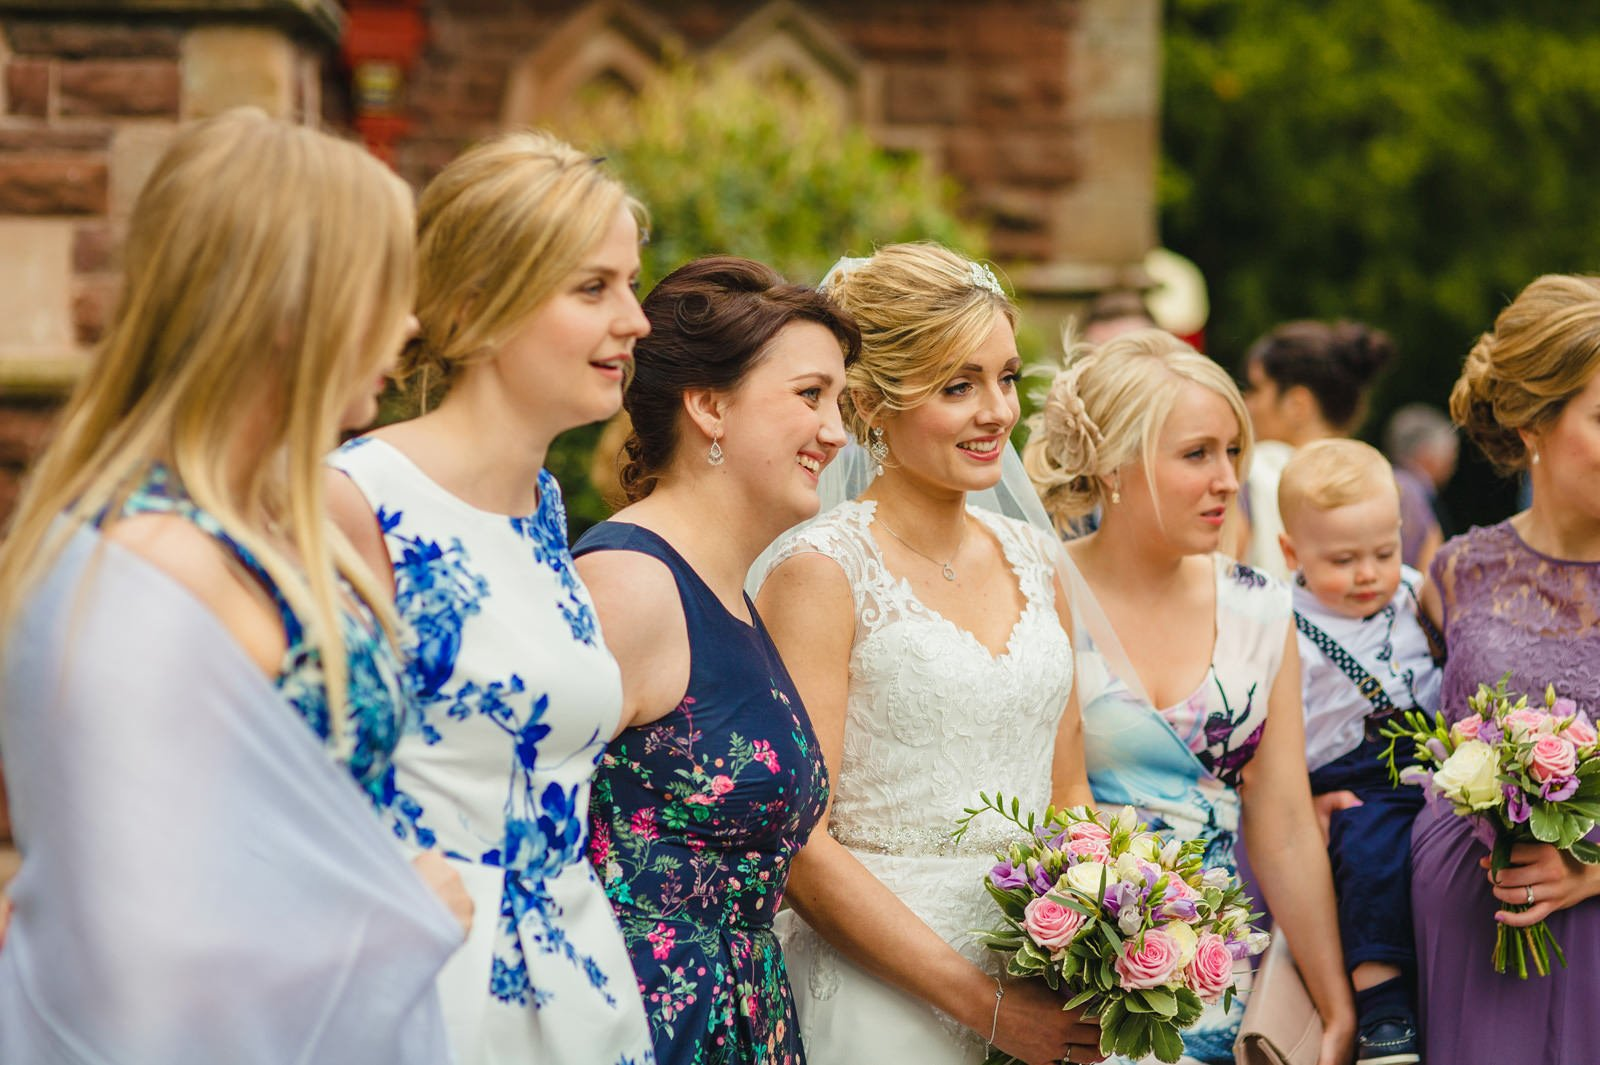 Millers Of Netley wedding, Dorrington, Shrewsbury | Emma + Ben 26